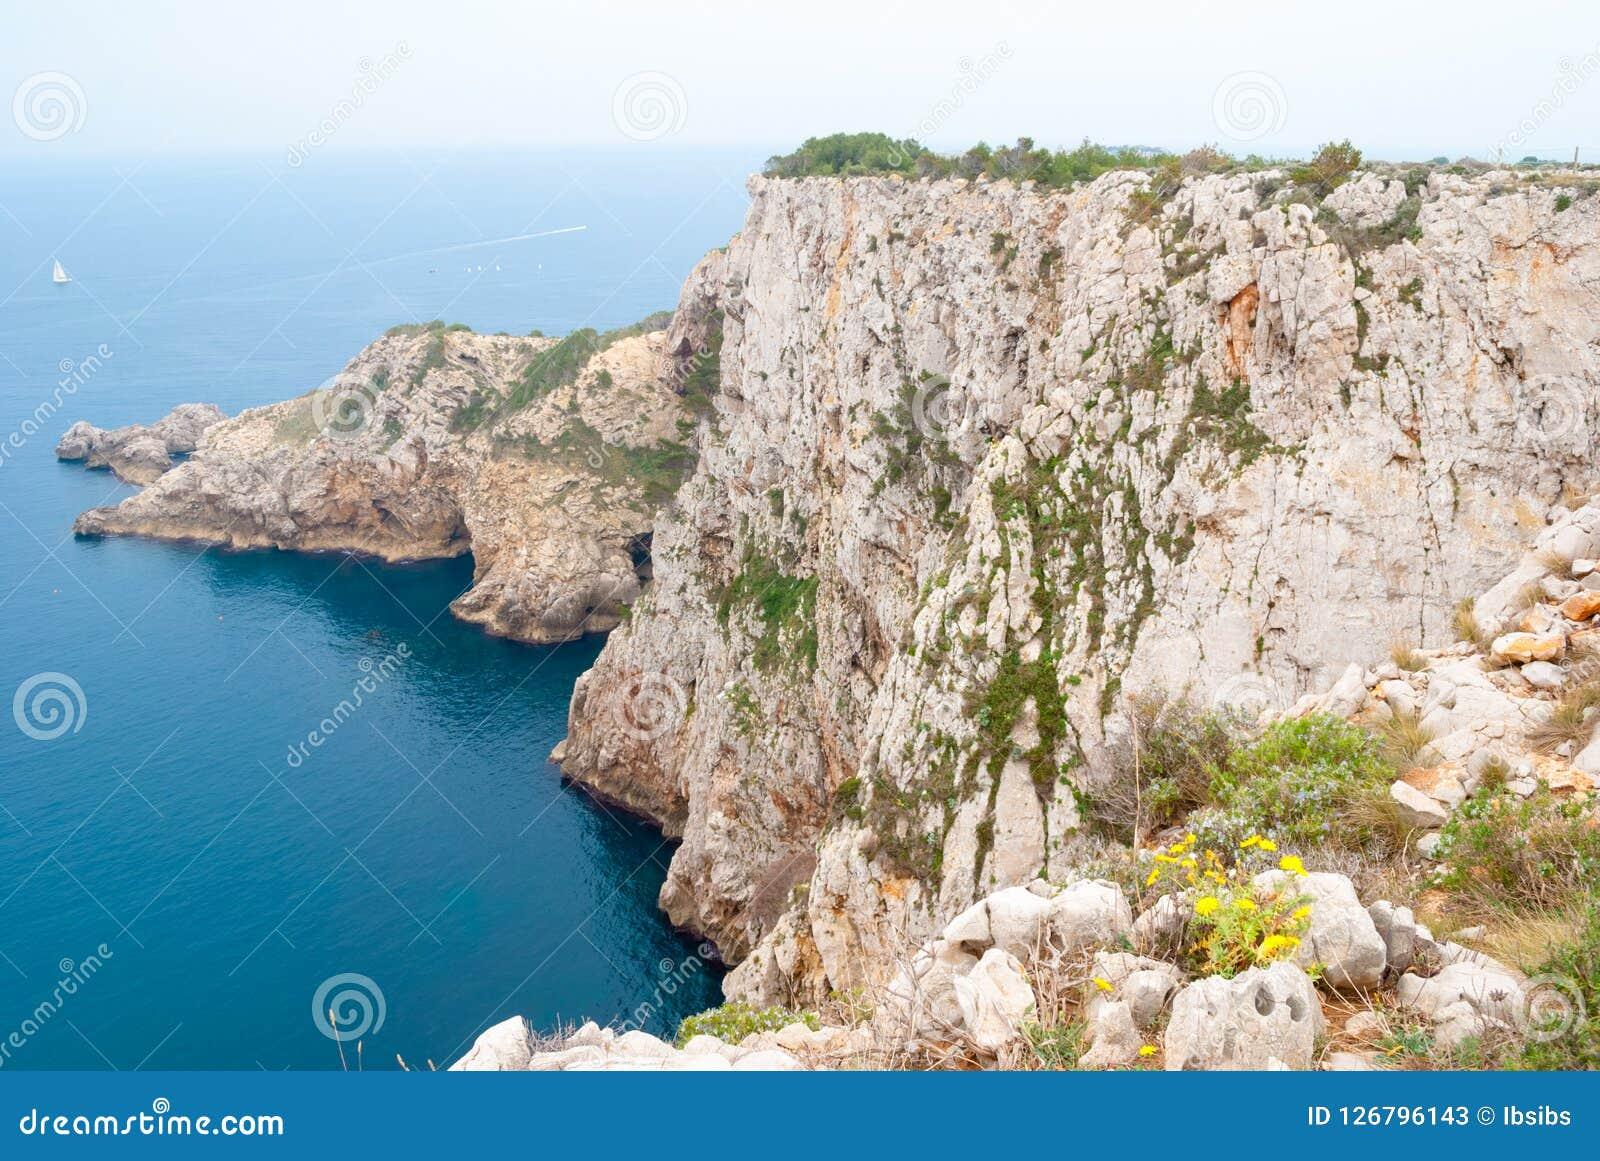 Breathtaking landscapes along Costa Brava in Catalonia Spain. Summer landscapes around Costa Brava, impressive cliffs and coastlines Stock Photos